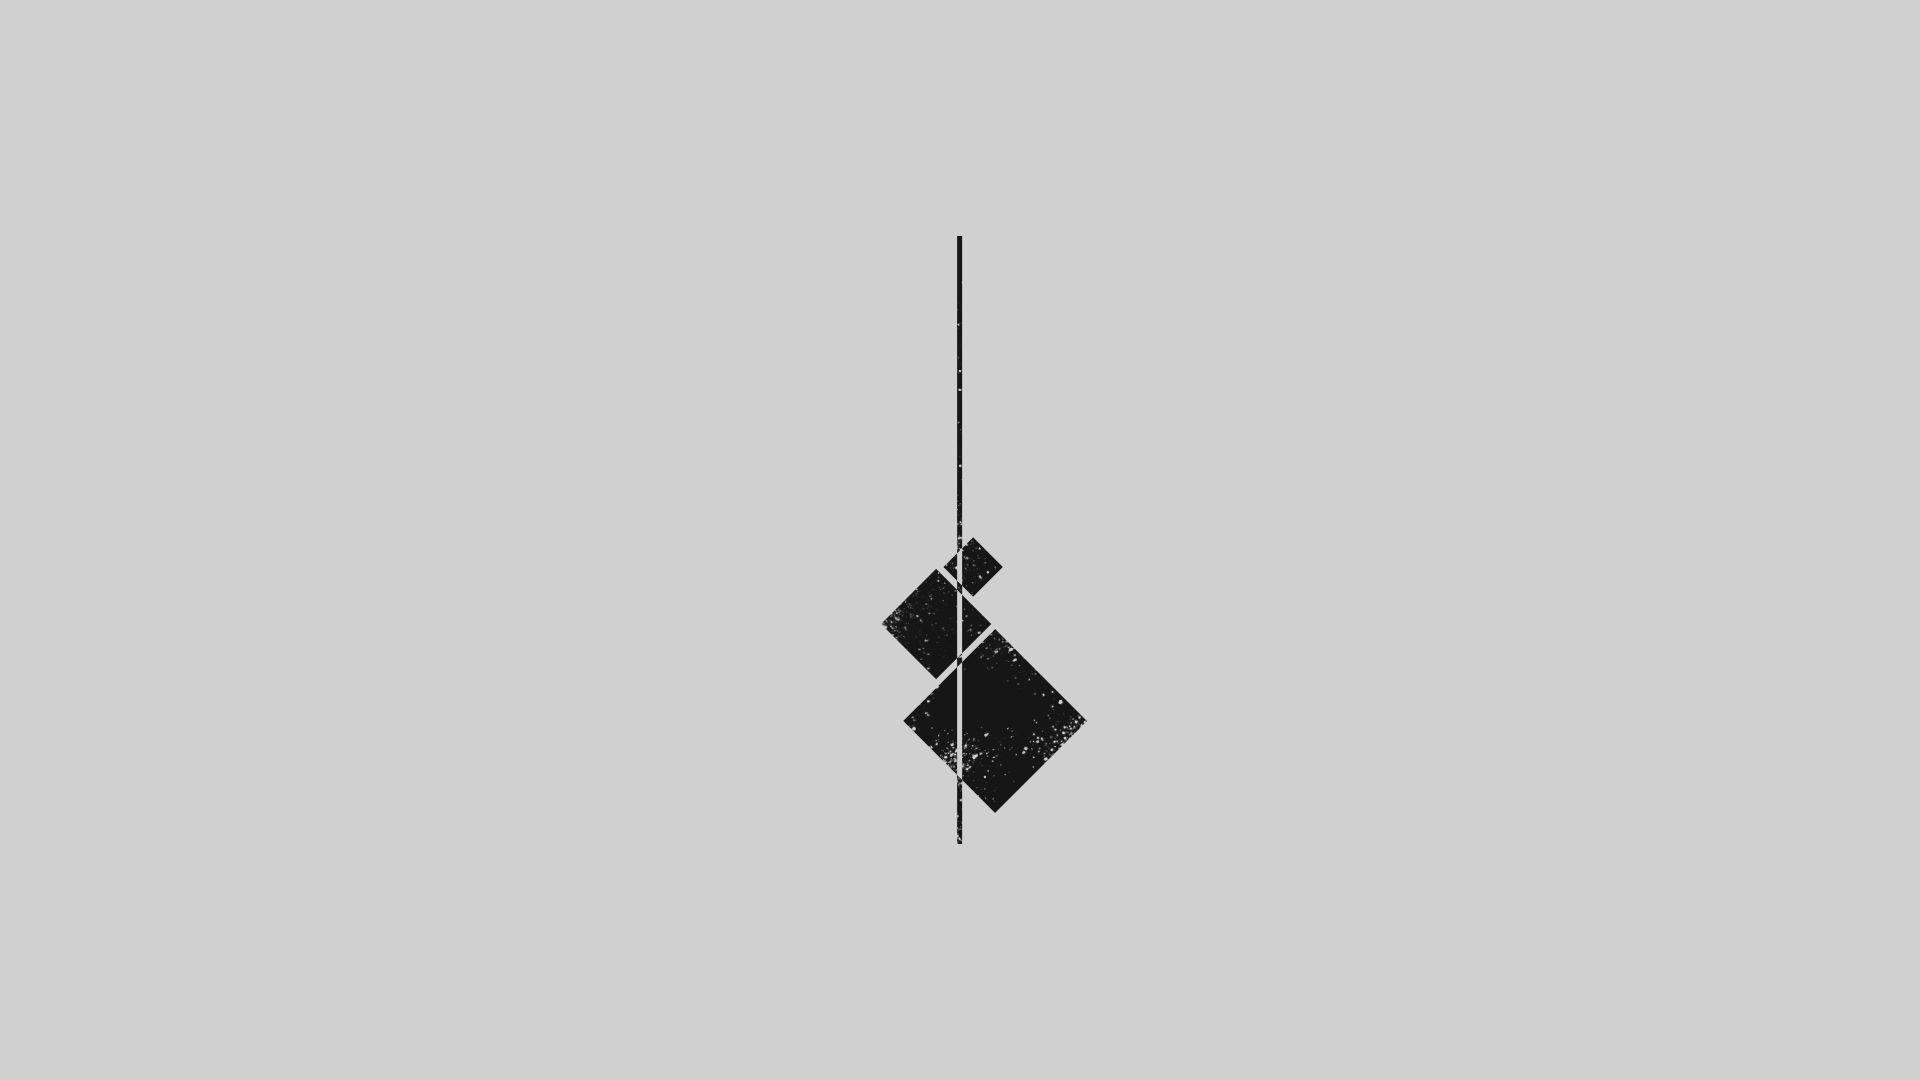 White Minimalism full hd 1080p wallpaper